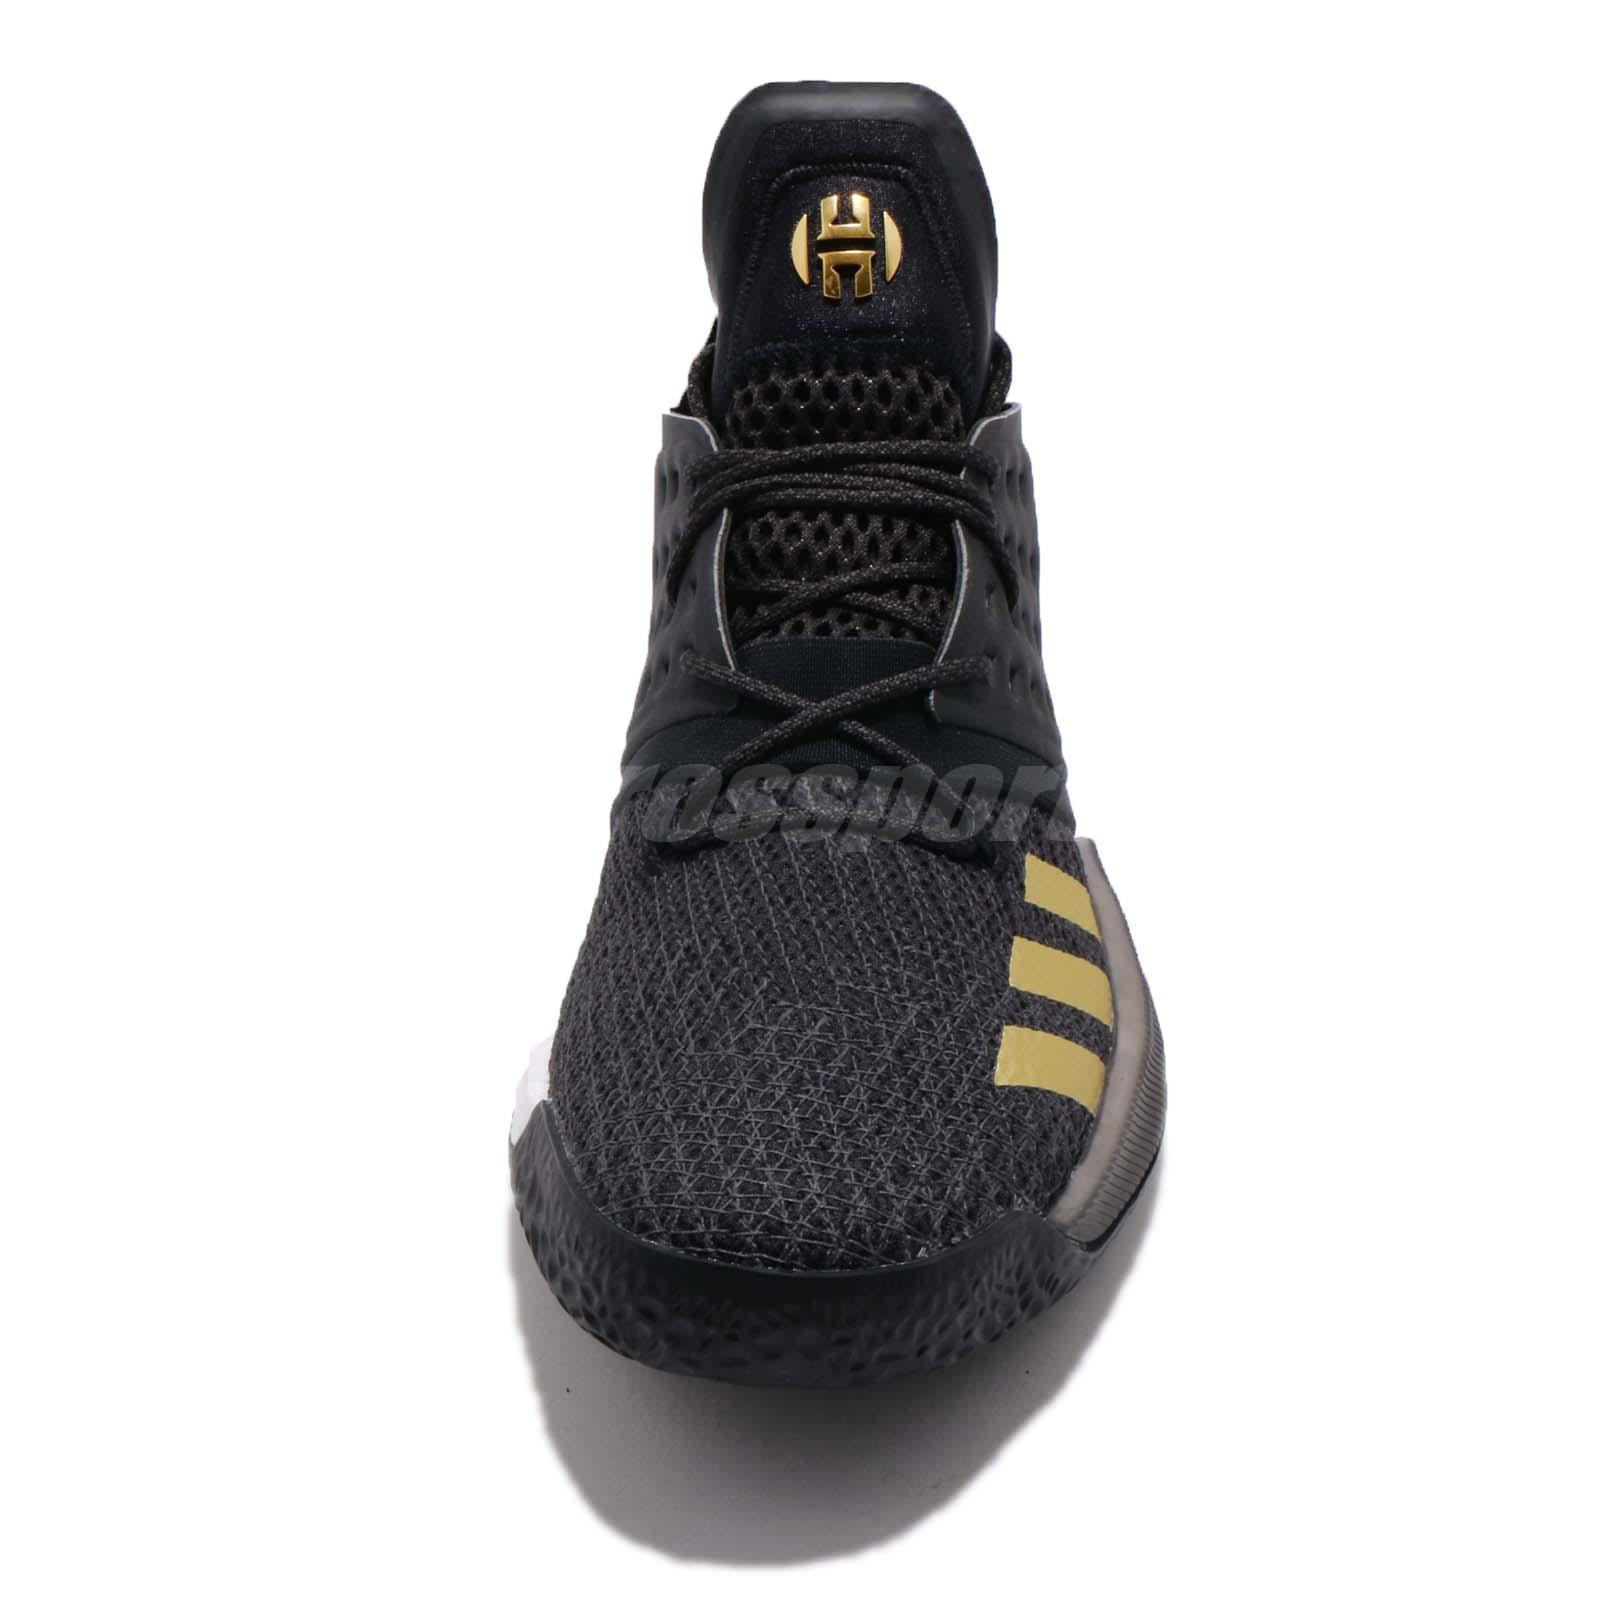 5d9c75ffe37d35 adidas Harden Vol. 2 James II Imma Be A Star Black Gold Men ...